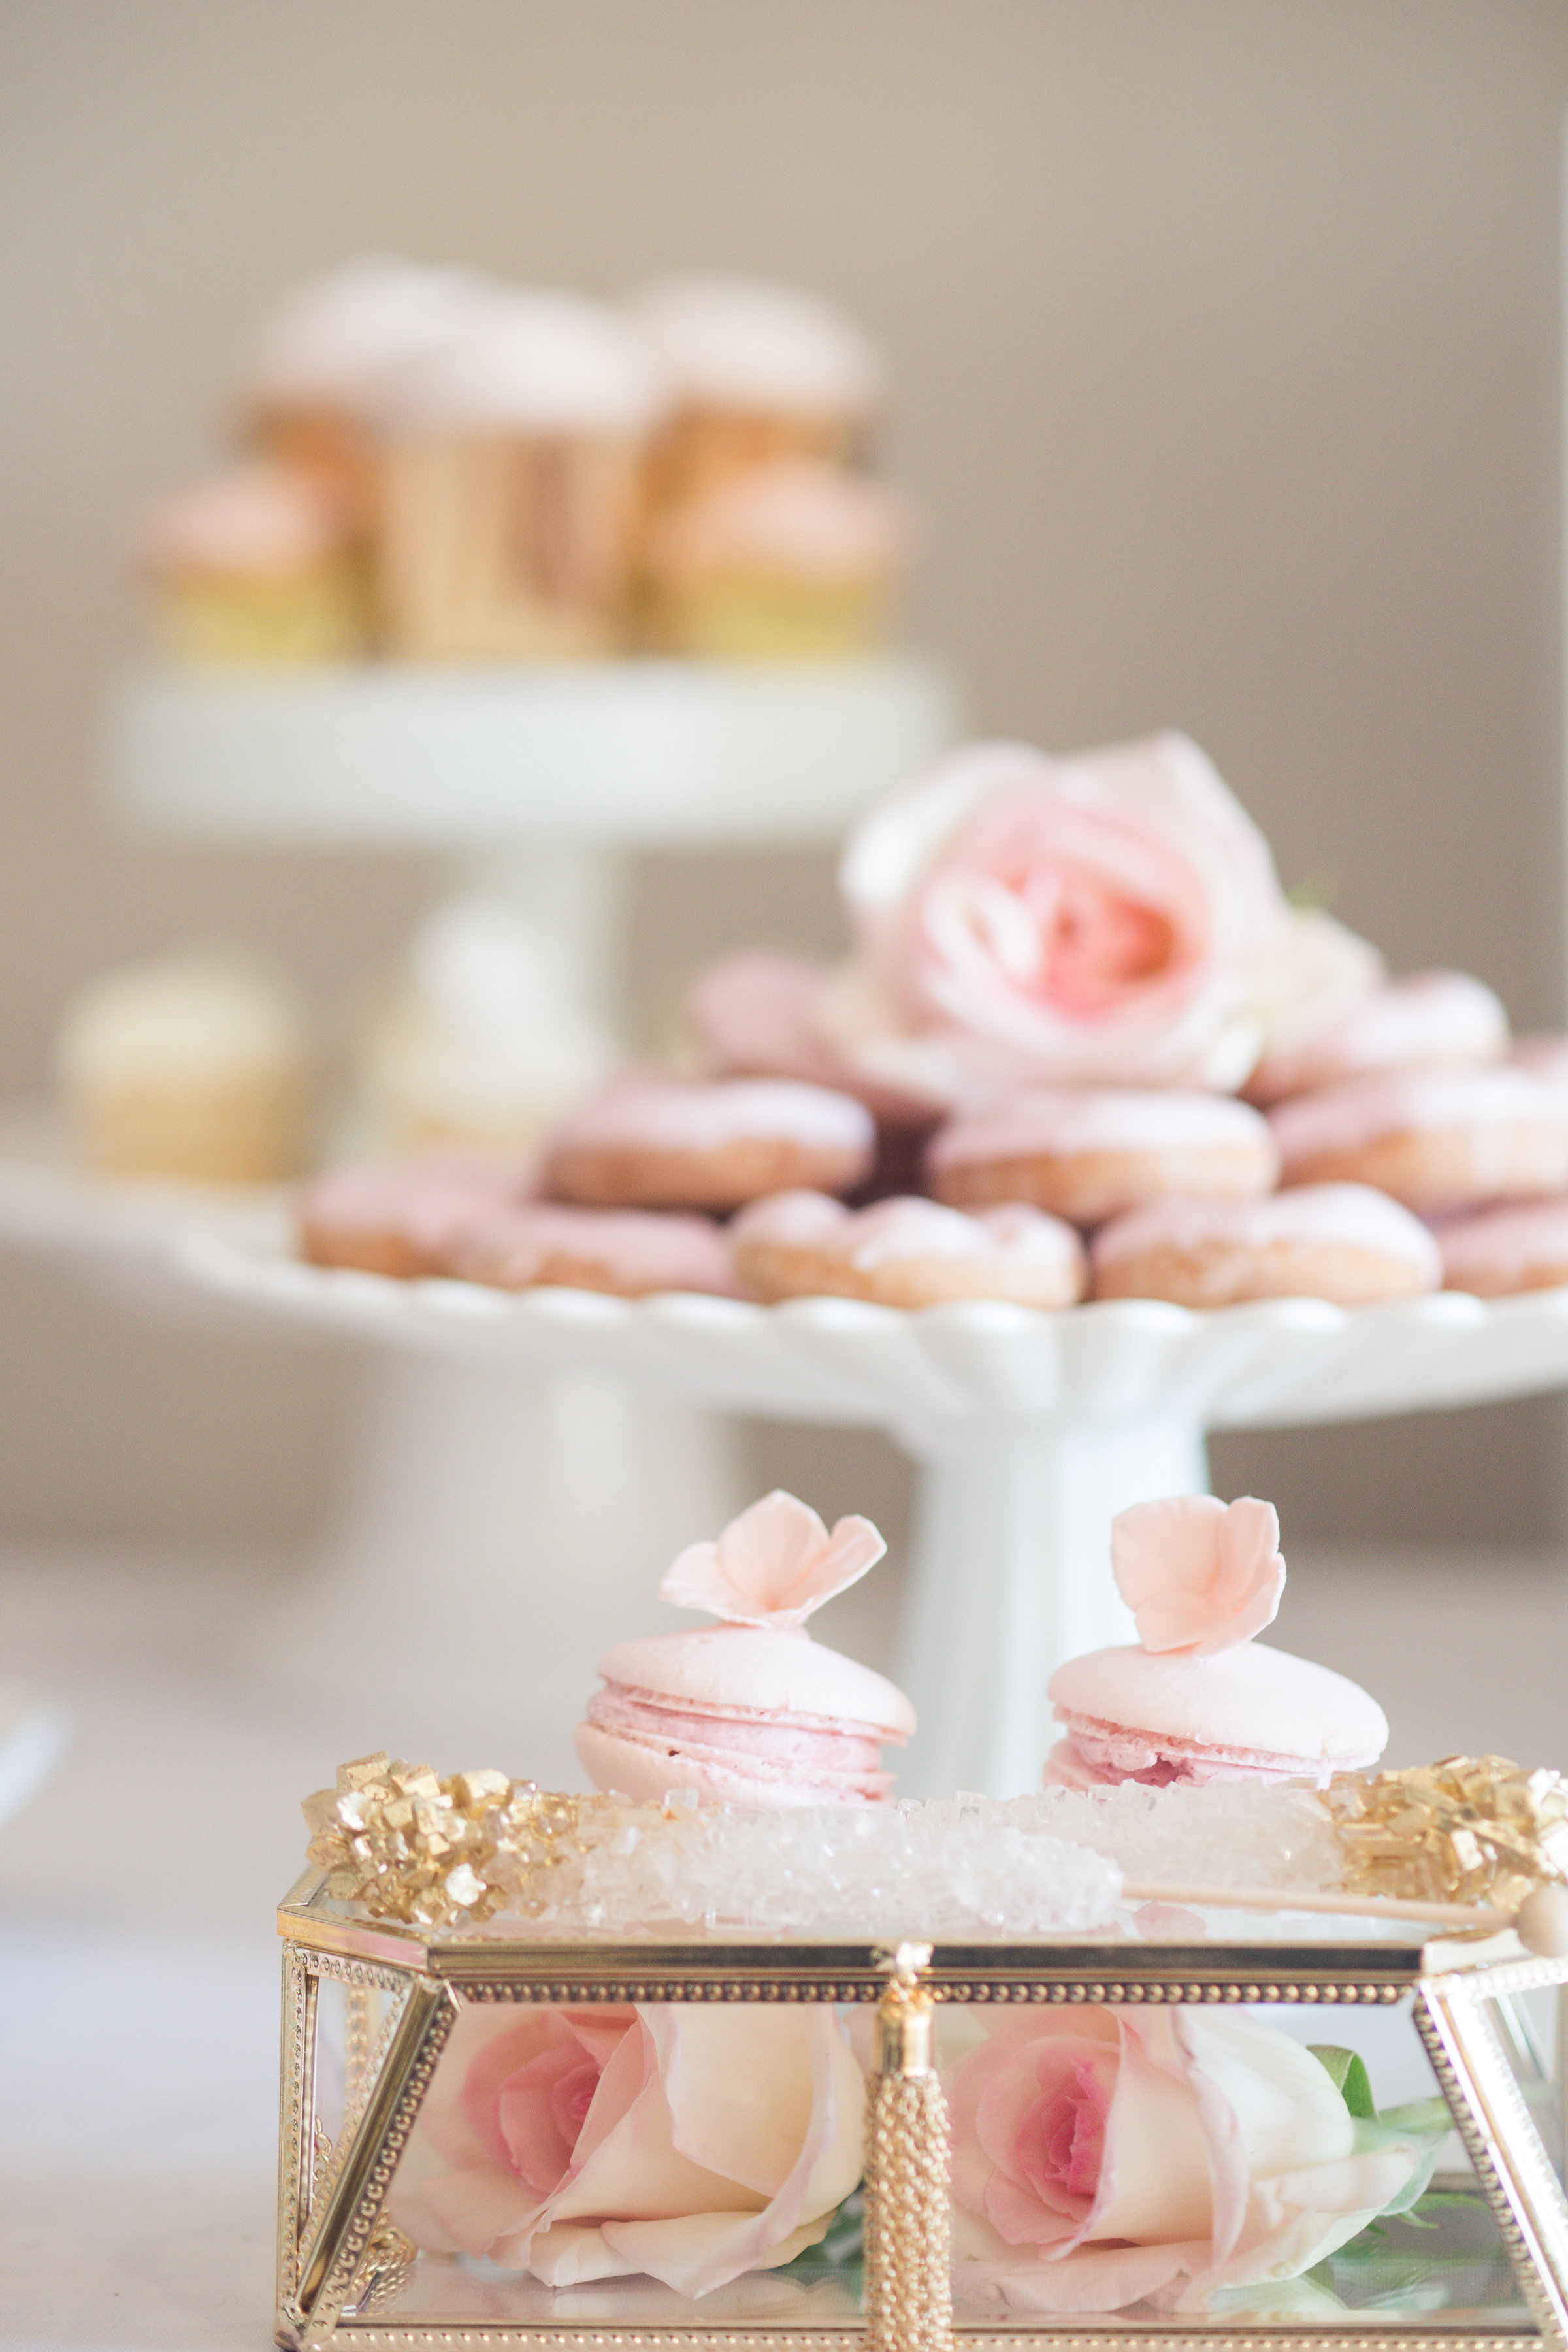 Kristina's Bridal Shower Sweet Table